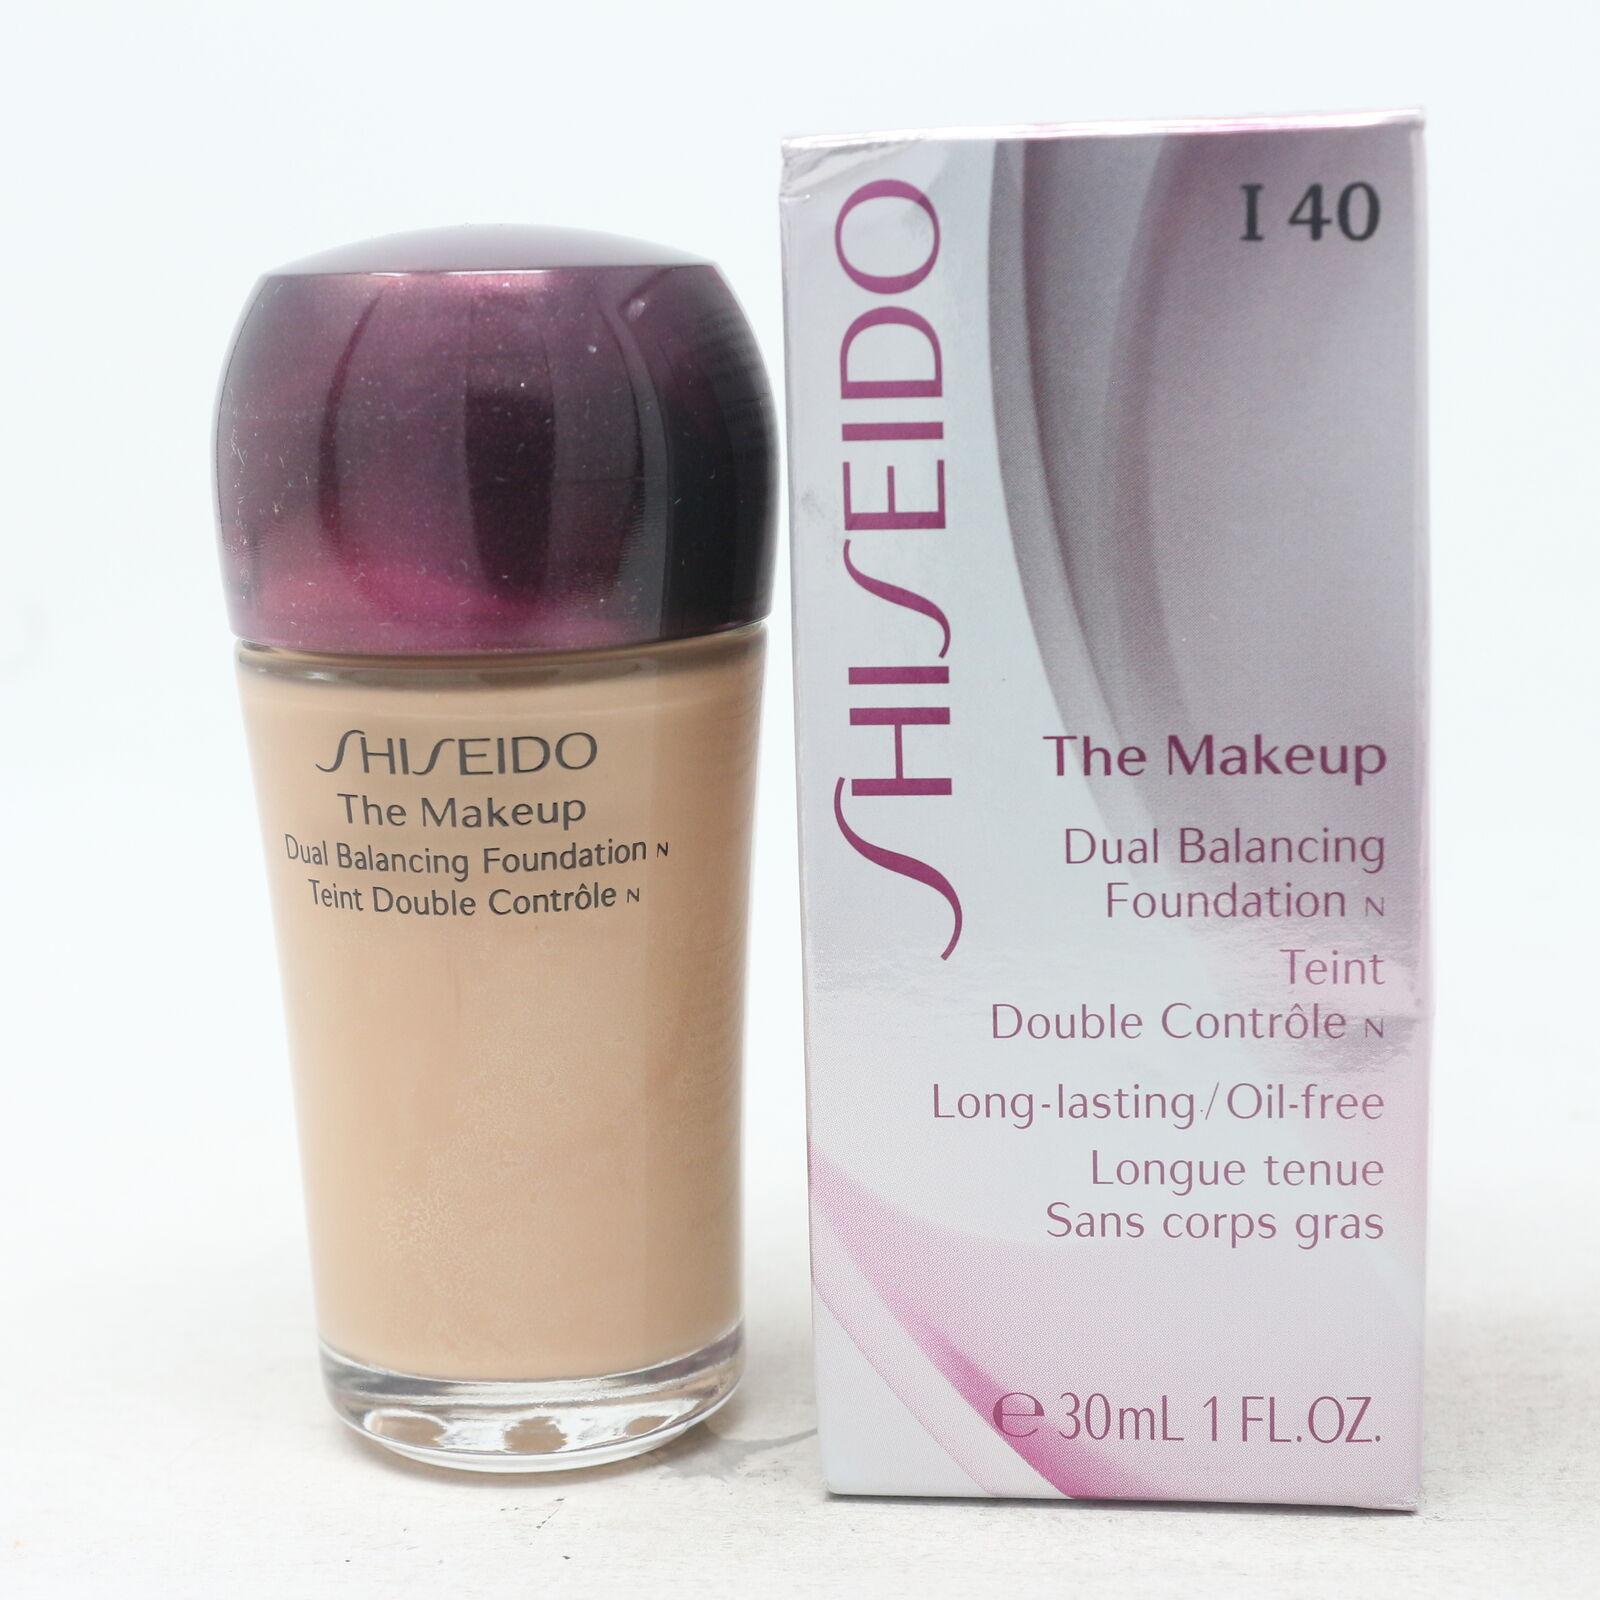 Shiseido The Makeup Dual Balancing Foundation O80 Deep Ochre 1 Oz For Sale Online Ebay